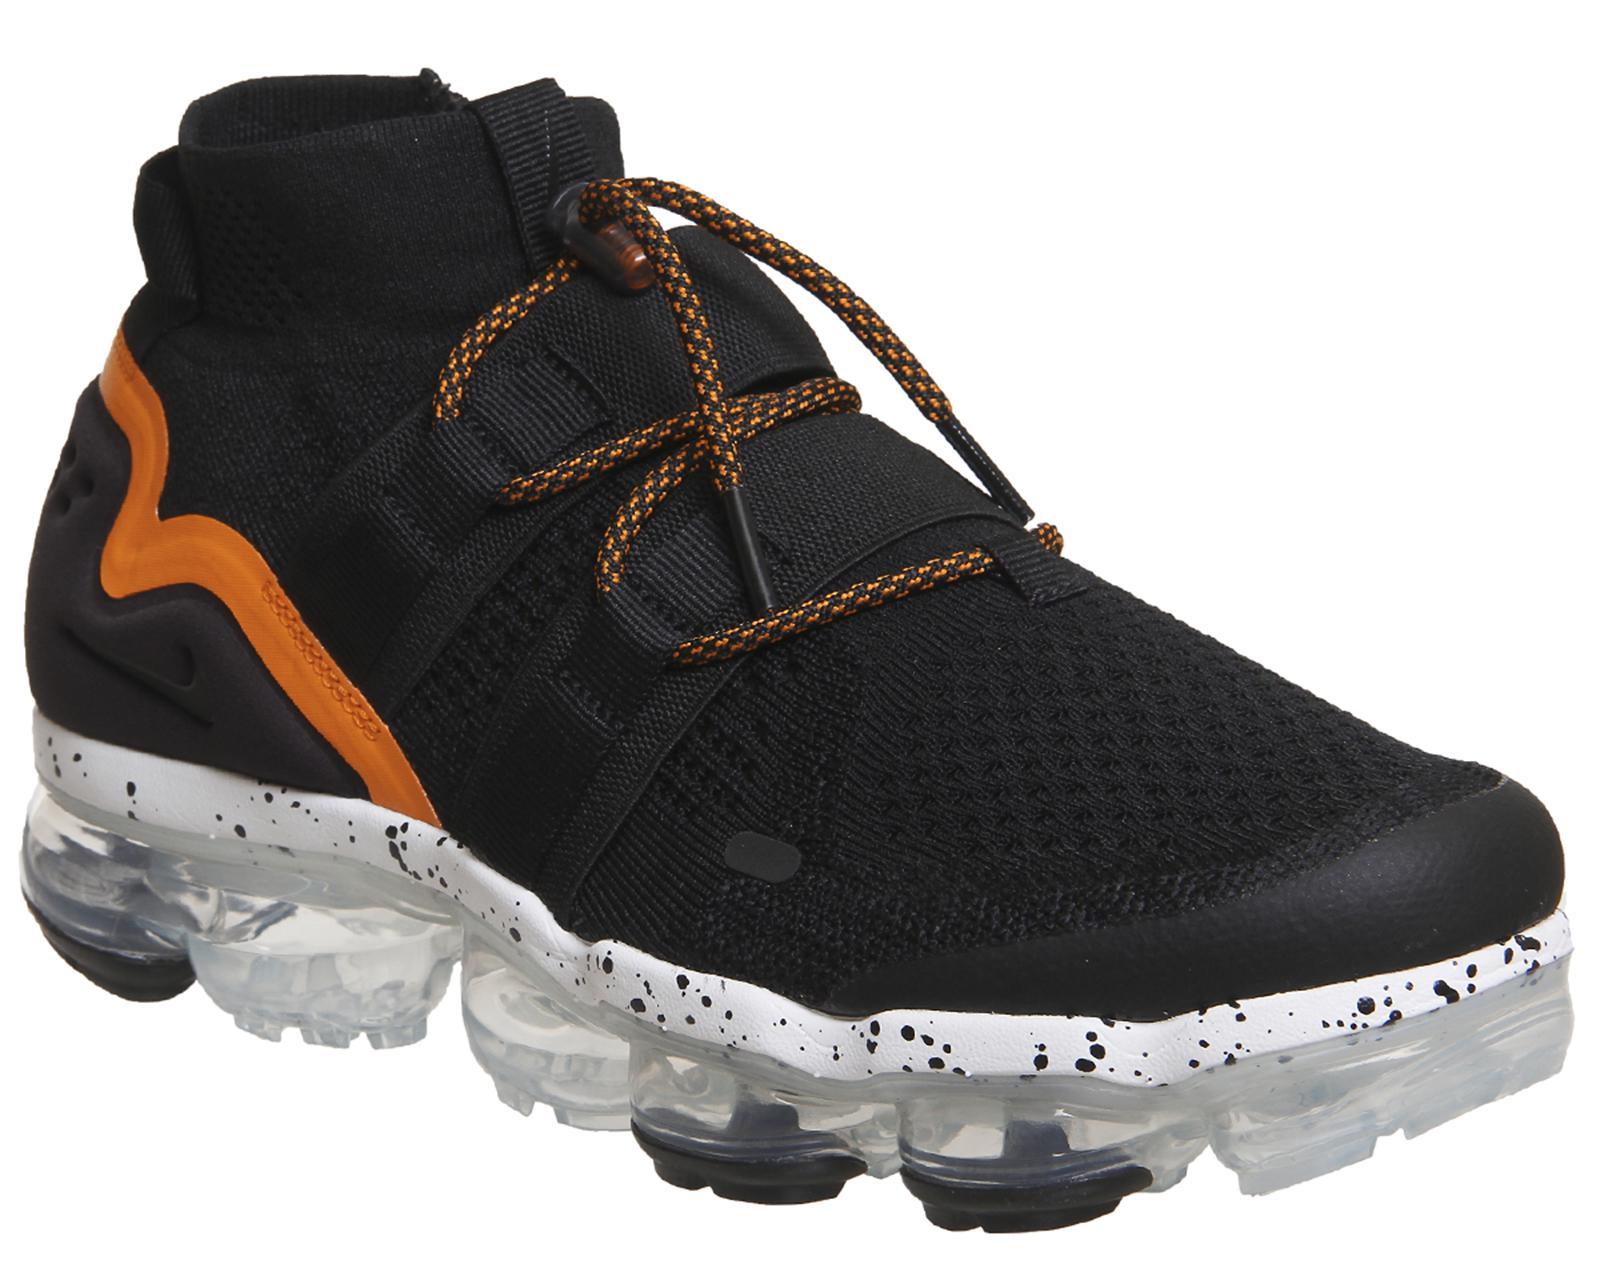 391f18ff3bbf Lyst - Nike Air Vapormax Flyknit Utility in Black